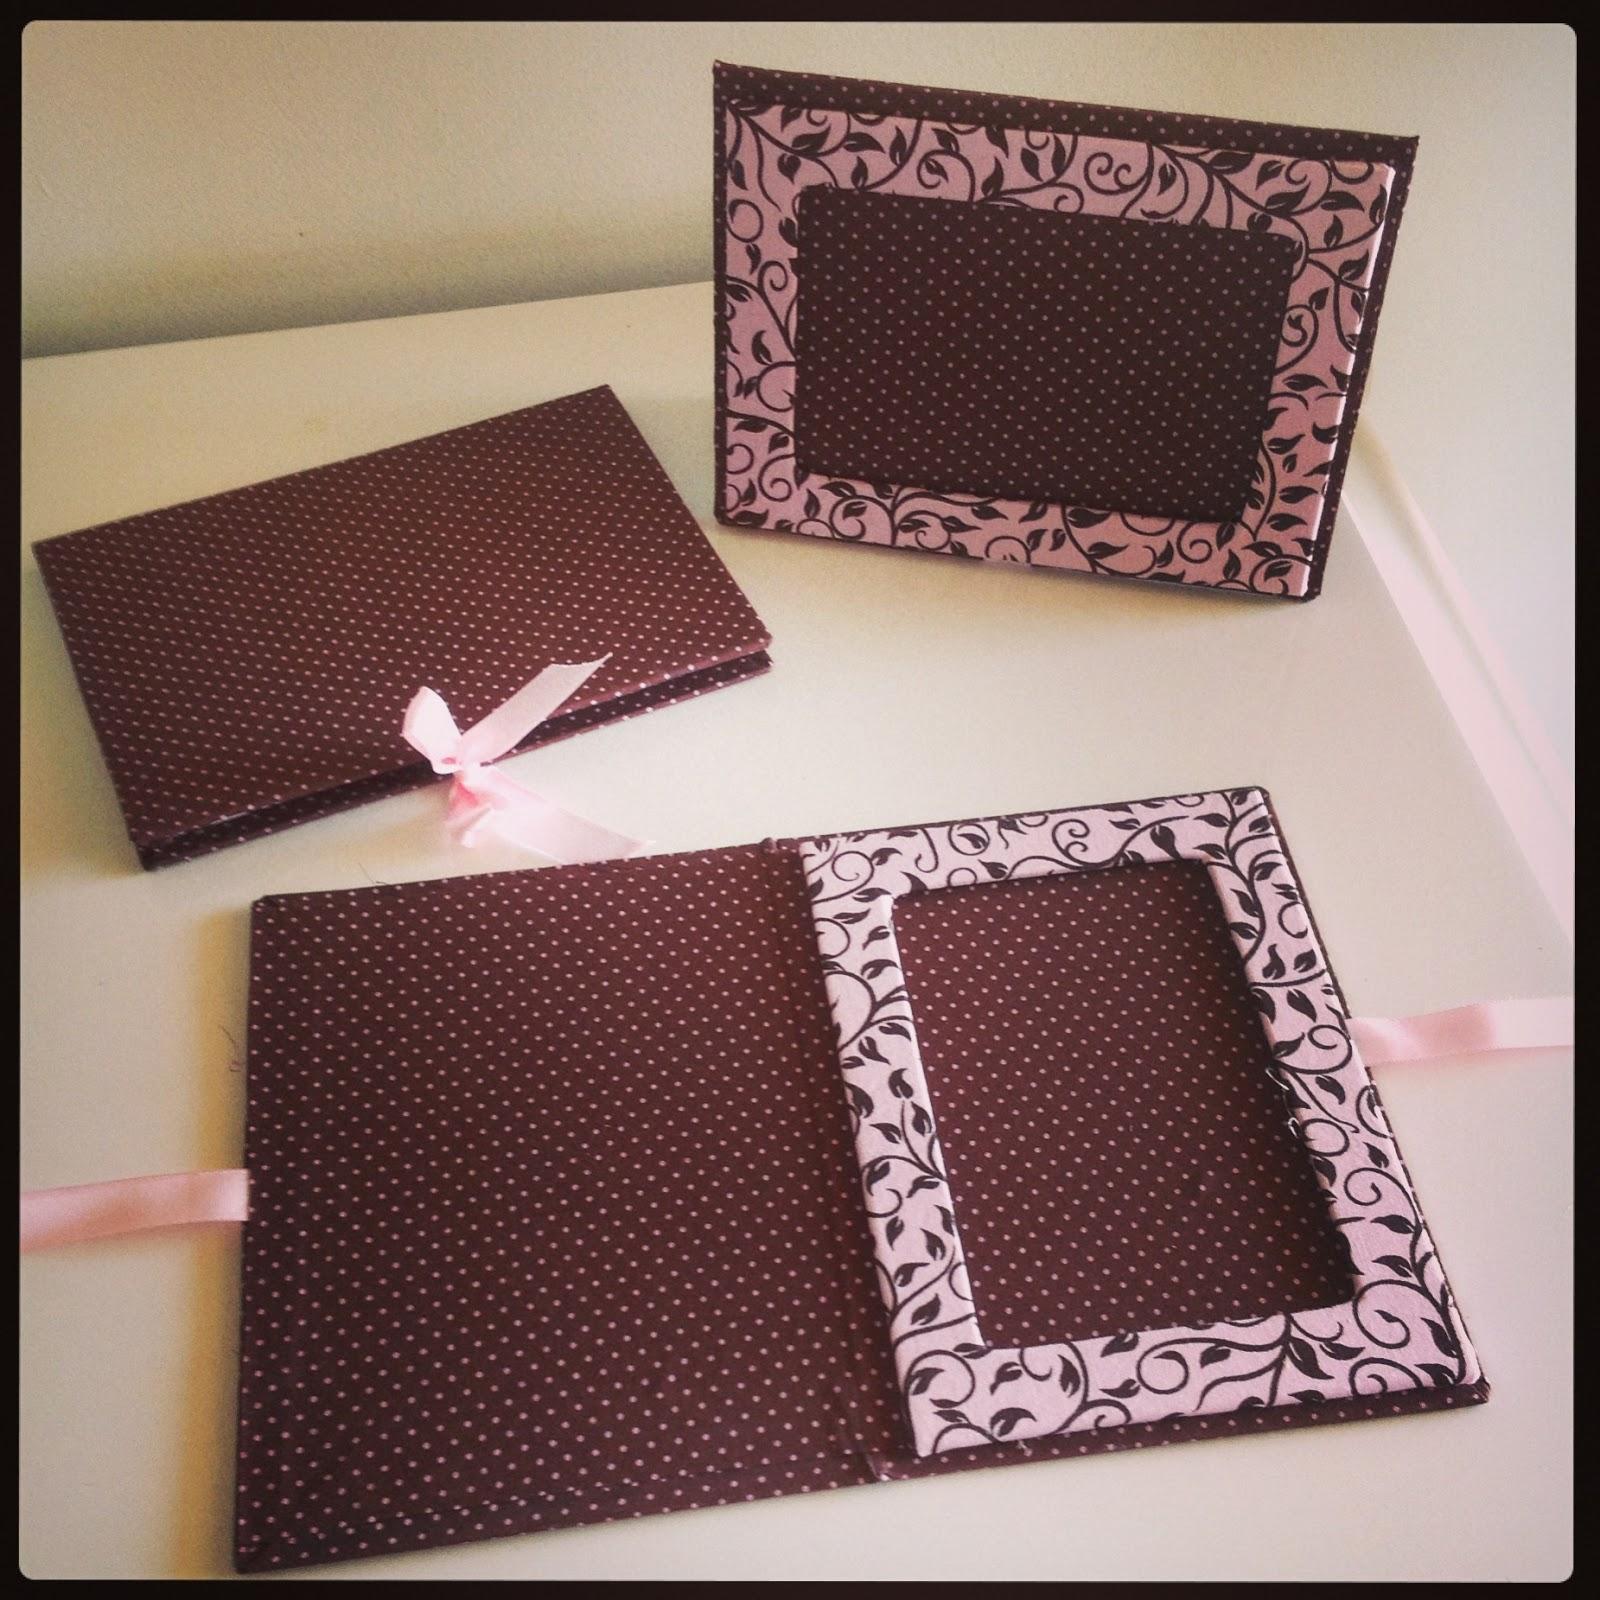 Embalagens Especiais Porta Retrato ou Convite de Casamento